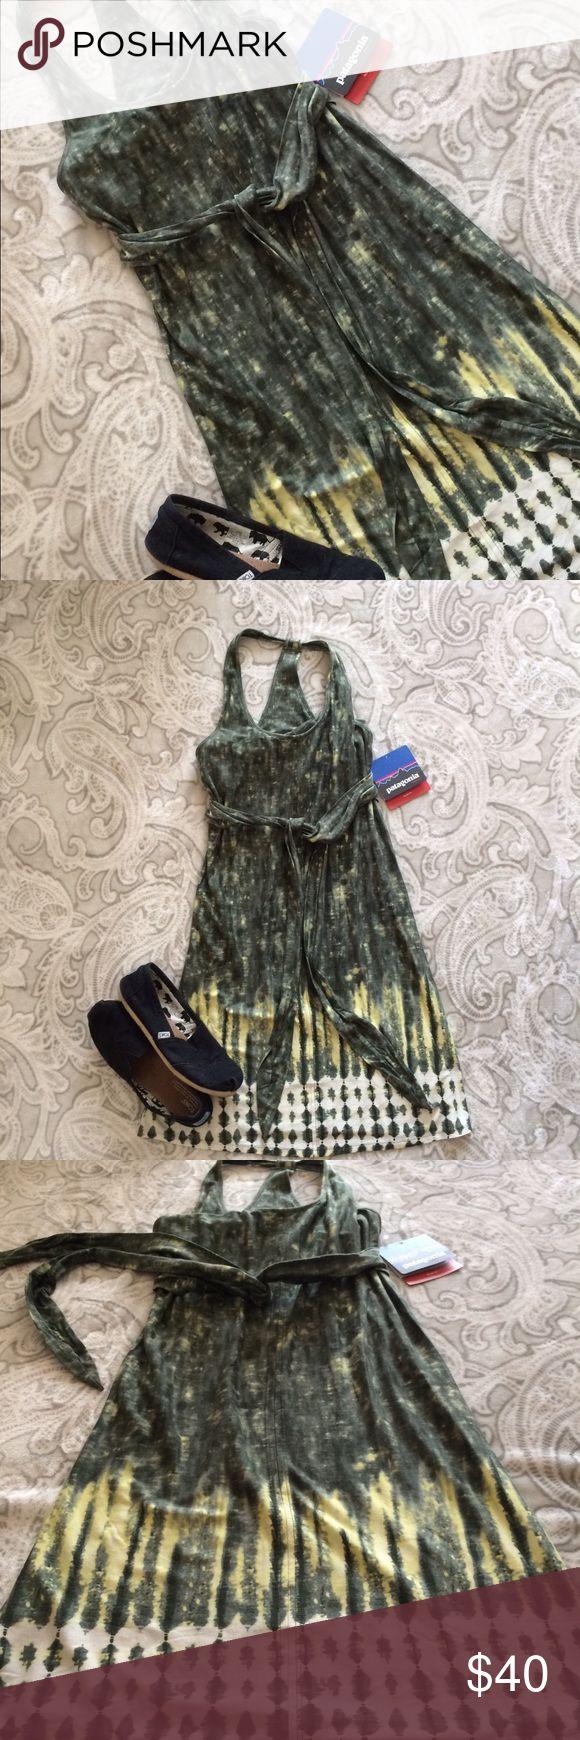 Patagonia dress Woman's Kiawha Island dress. Slim fit.  Perfect for cruises. Patagonia Dresses